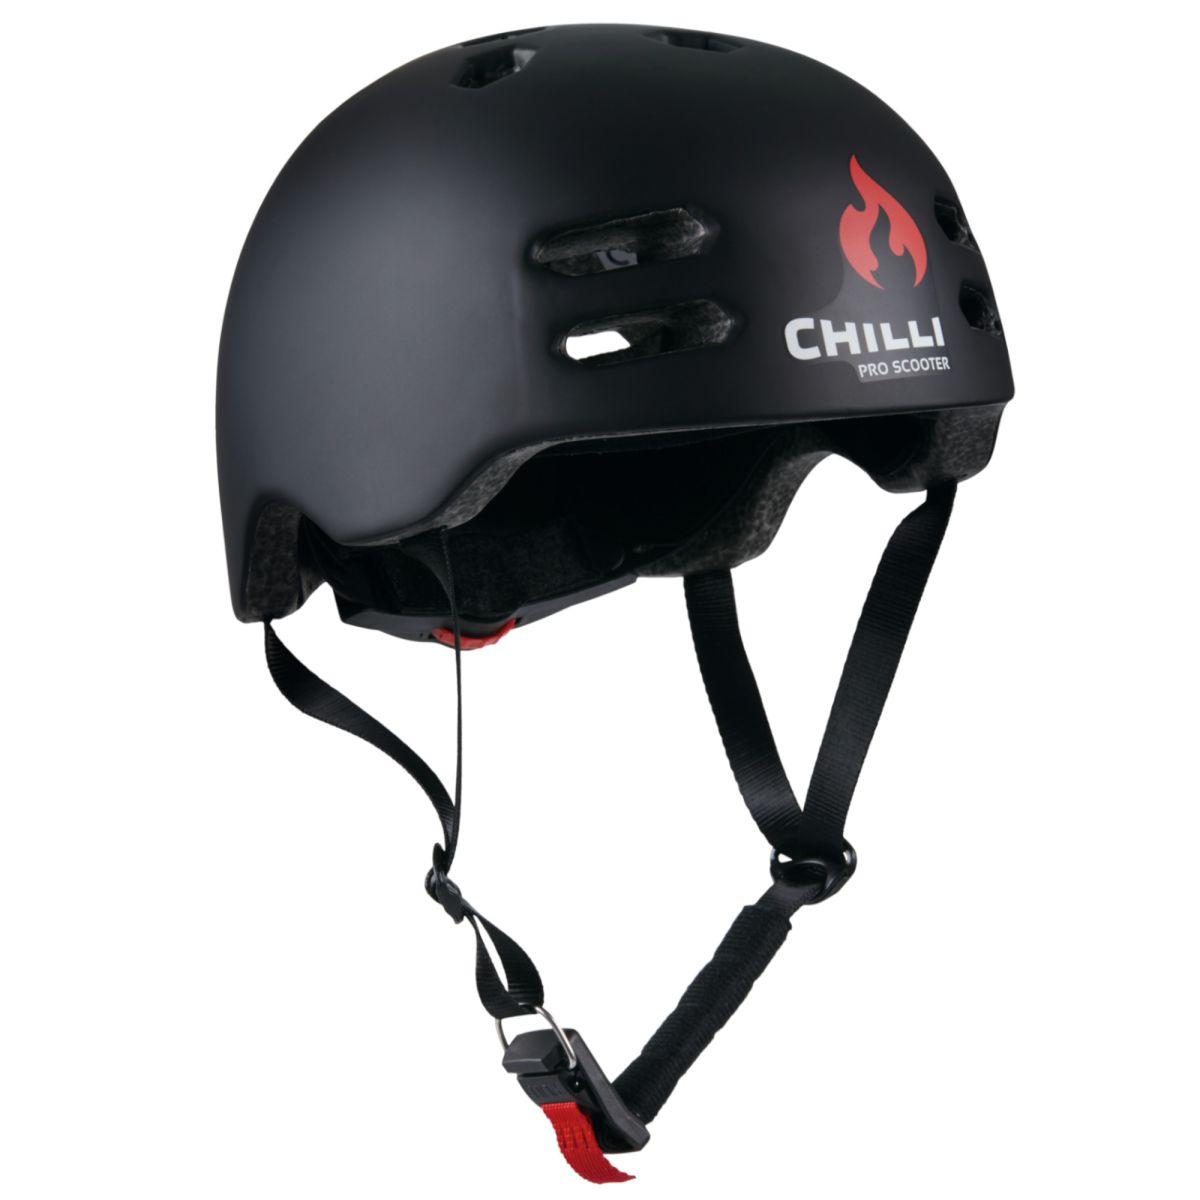 Obrázek Chilli helma Inmold černá M (55-58 cm)